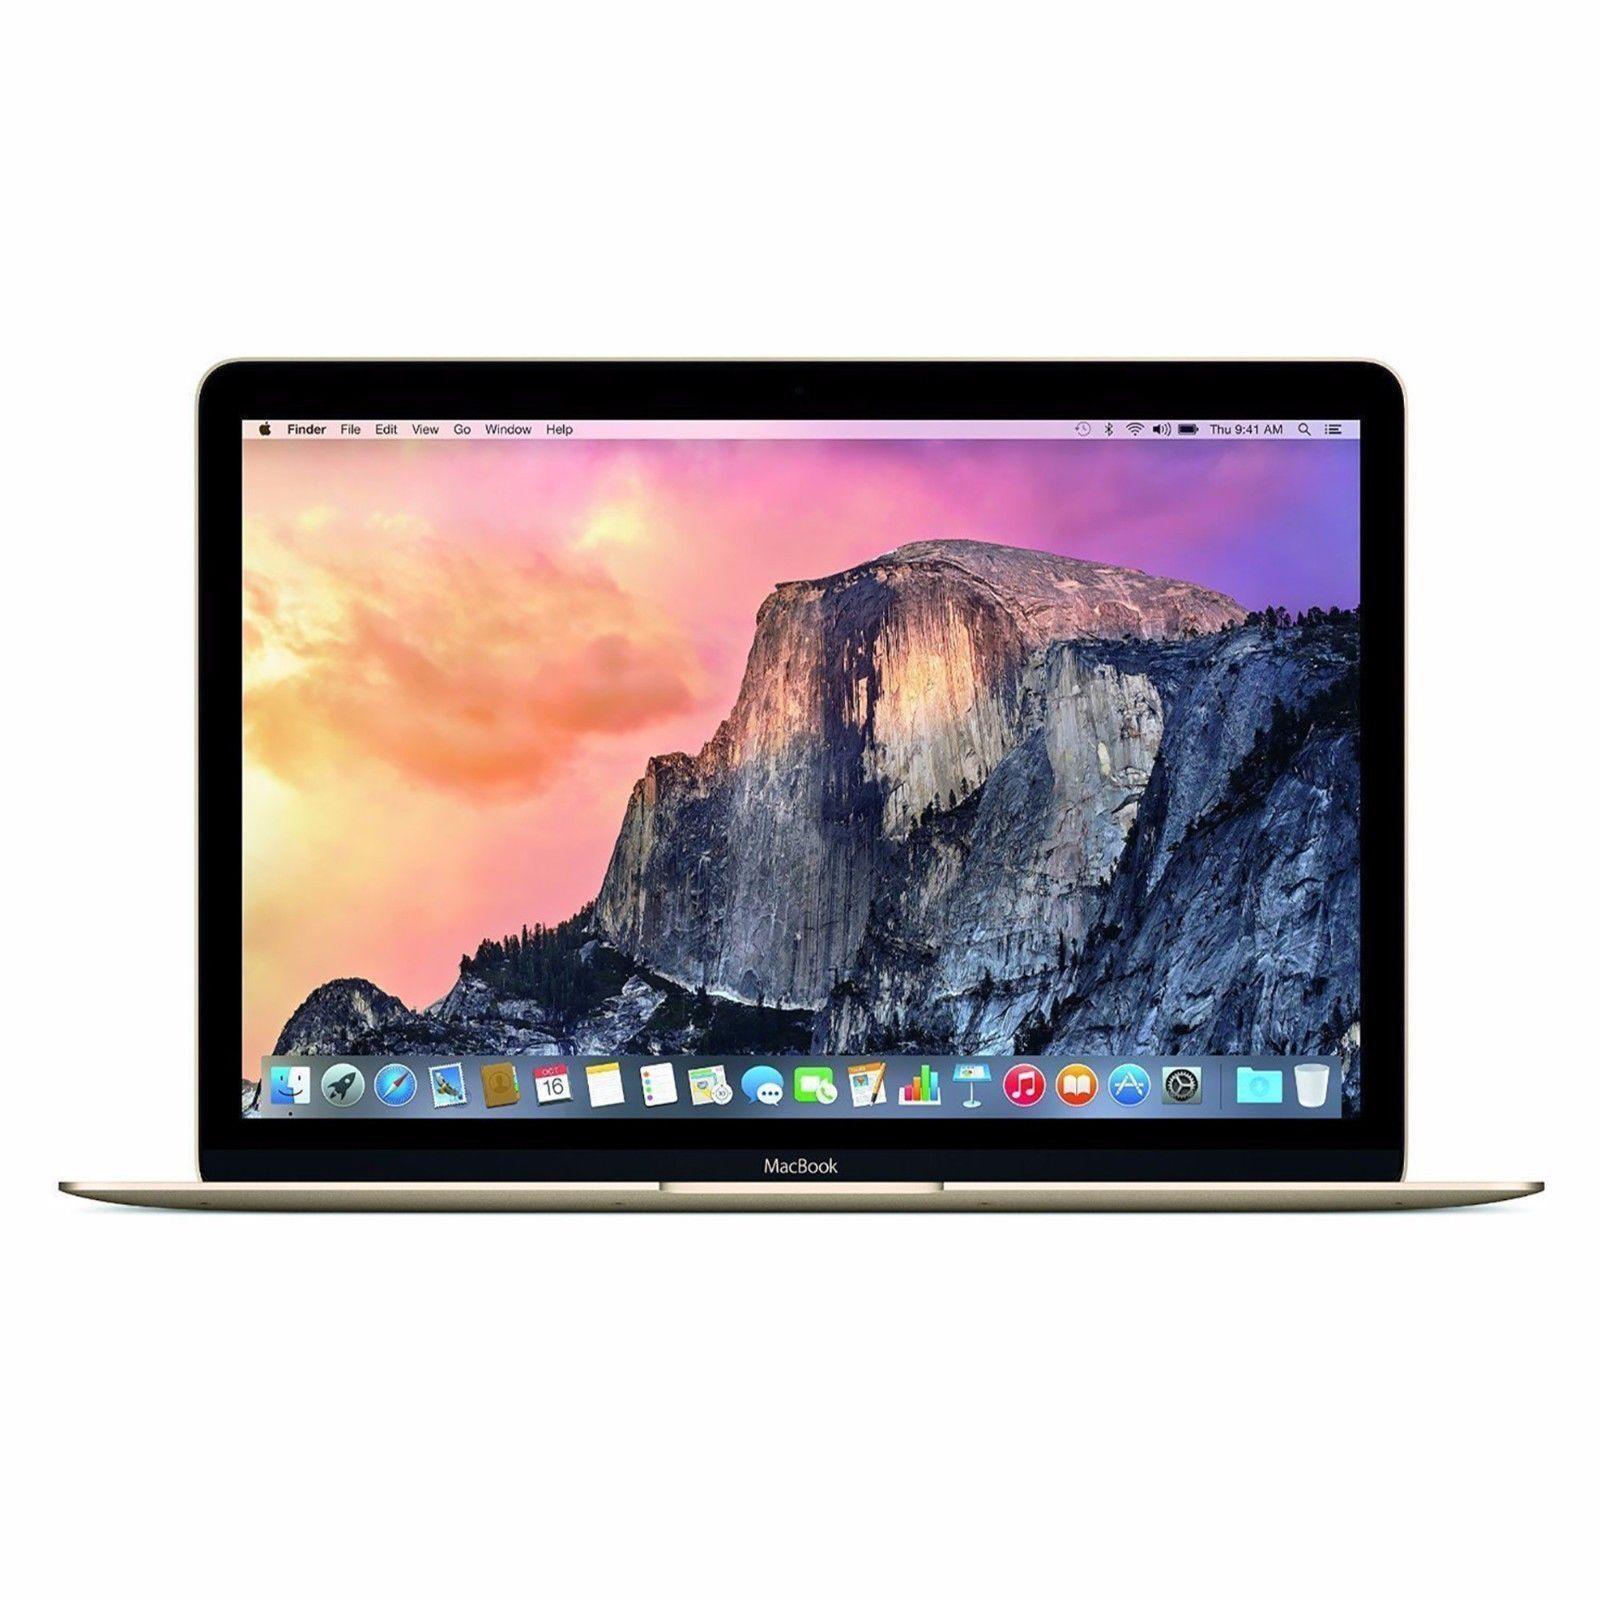 Macbook - Apple Macbook 12'' 512GB Intel Core M Dual-Core Laptop - Gold/Silver/Space Gray